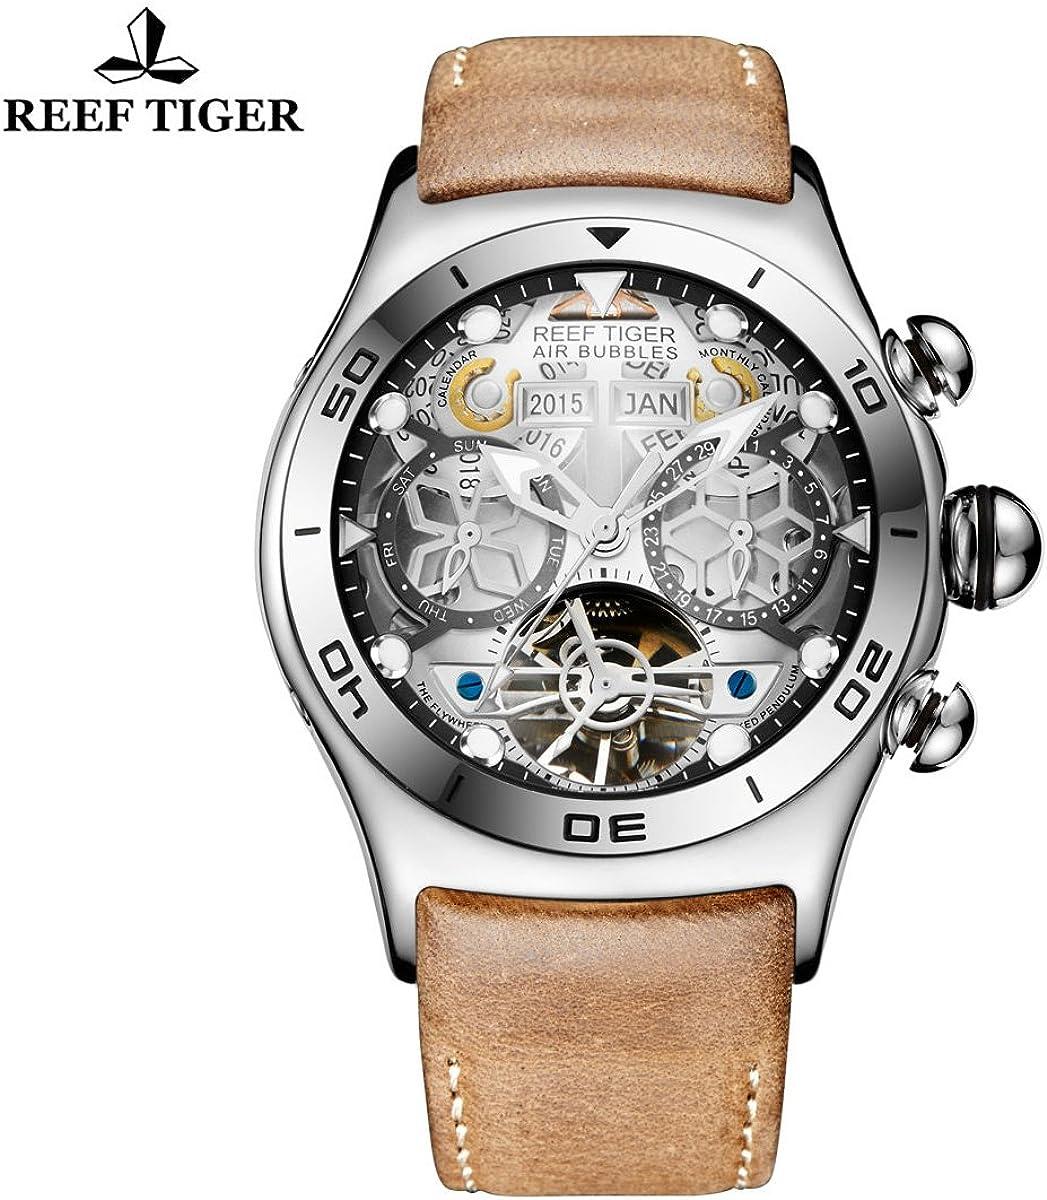 Reef Tiger 男性運動腕時計 スチール 夜光 日付 本革 ブラックダイヤル 腕時計 RGA703